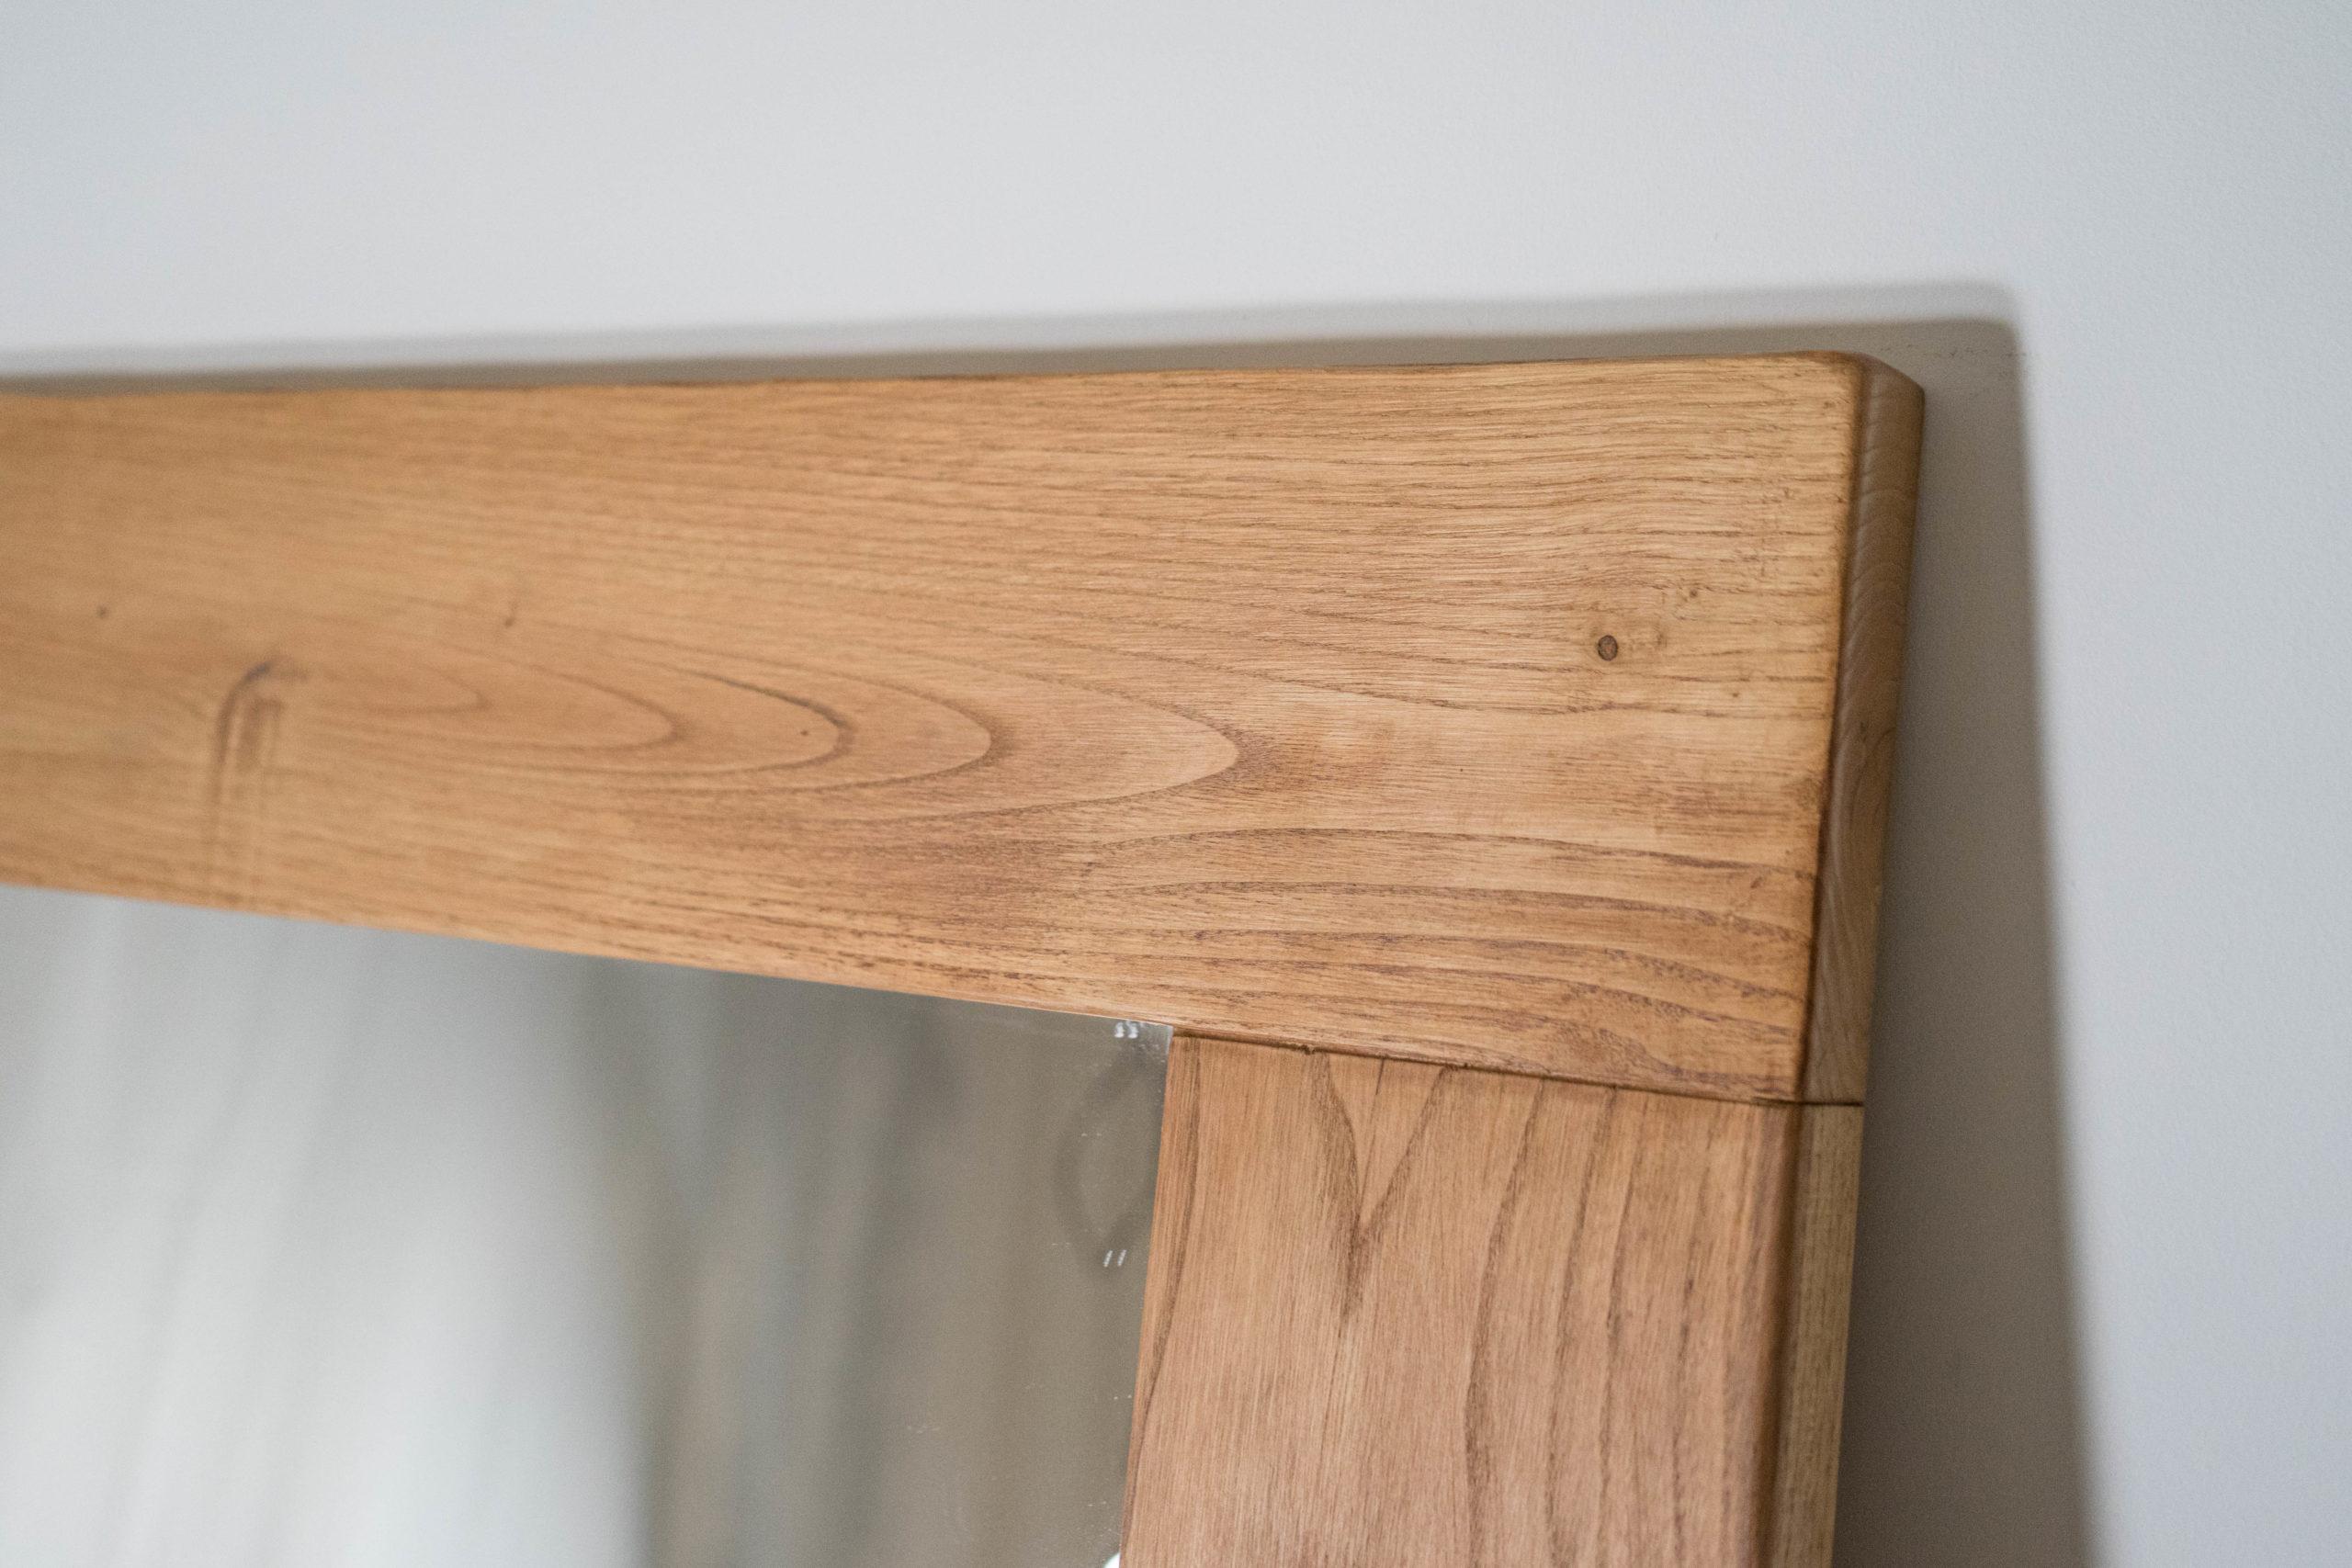 madera de castaño espejo bonito